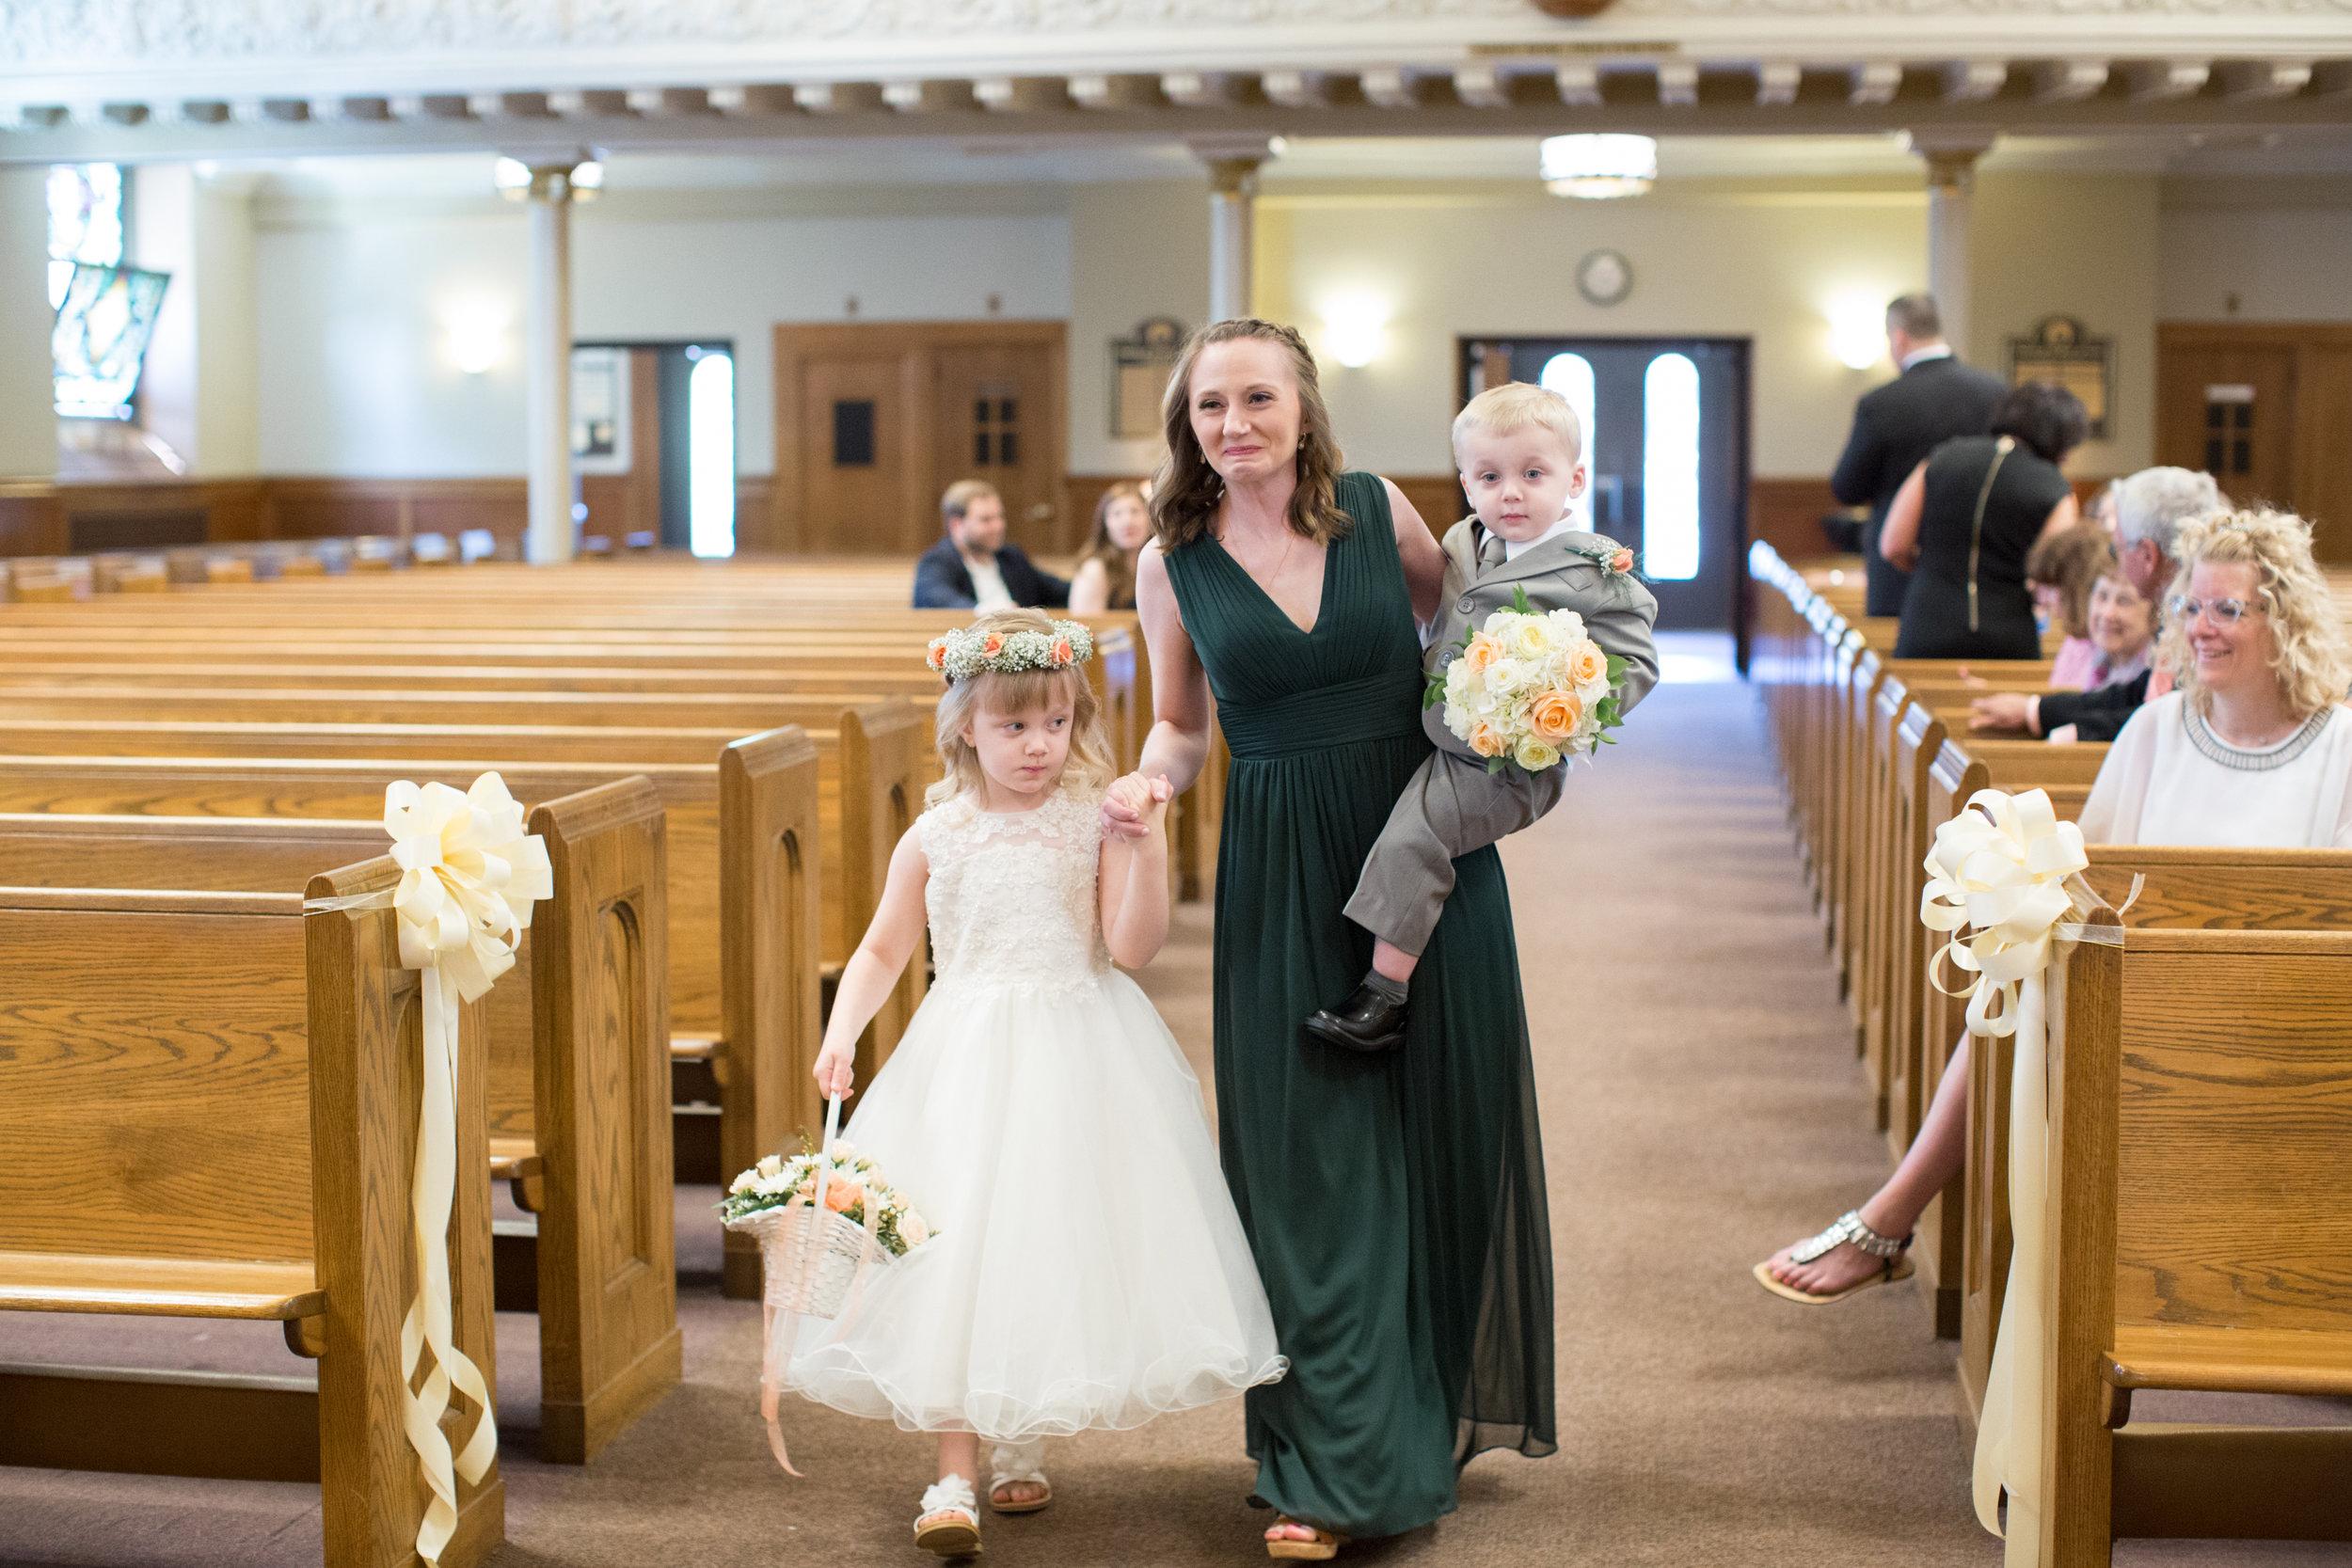 Fiorellis Wedding Photos_JDP-39.jpg